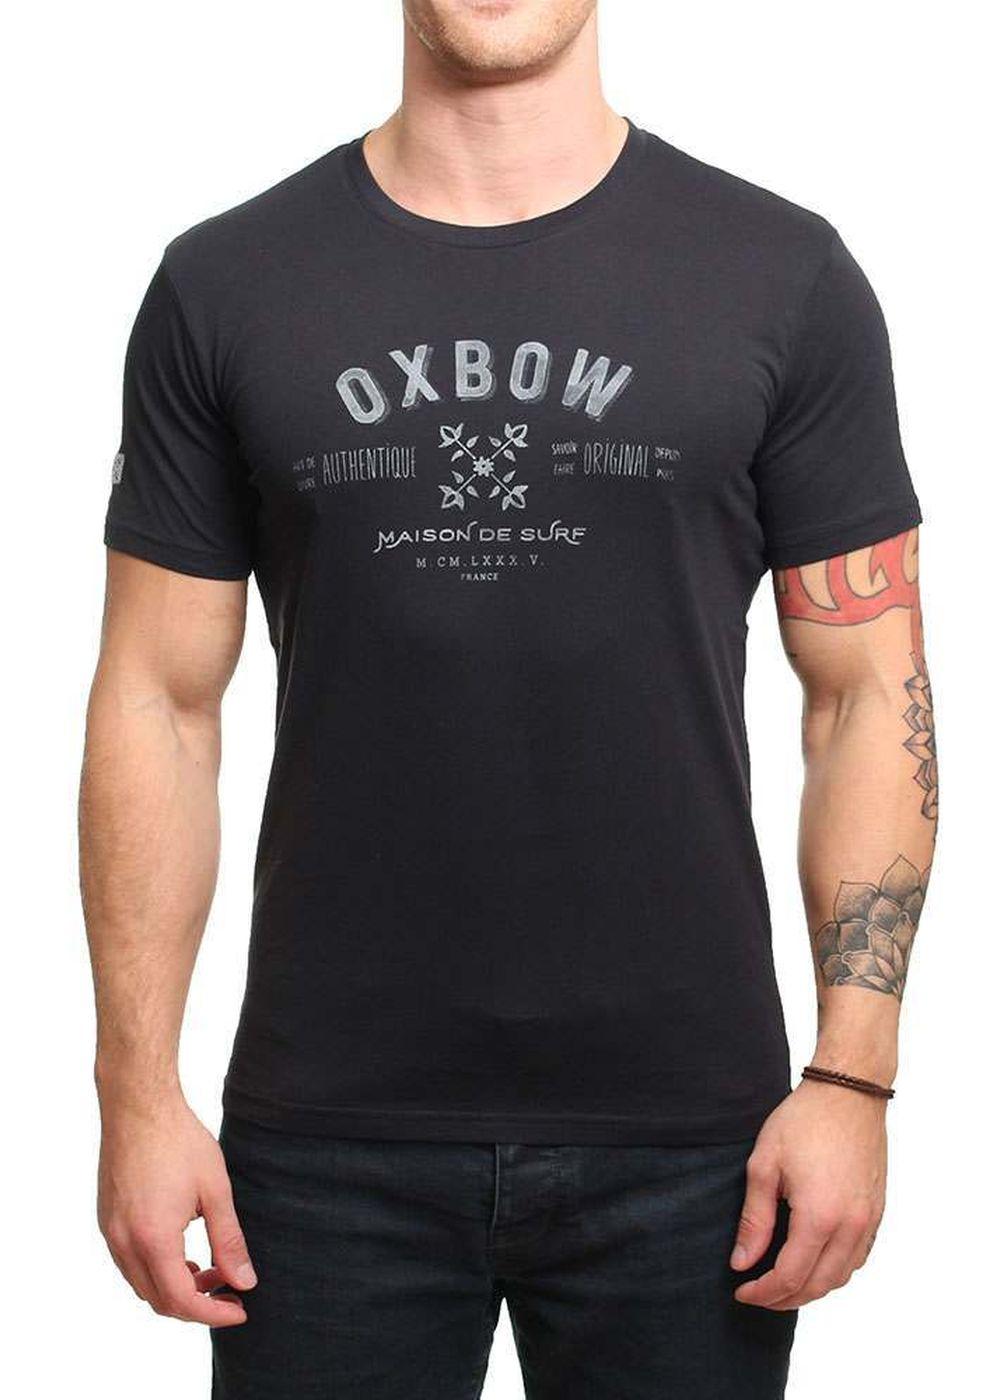 oxbow-tialk-tee-noir